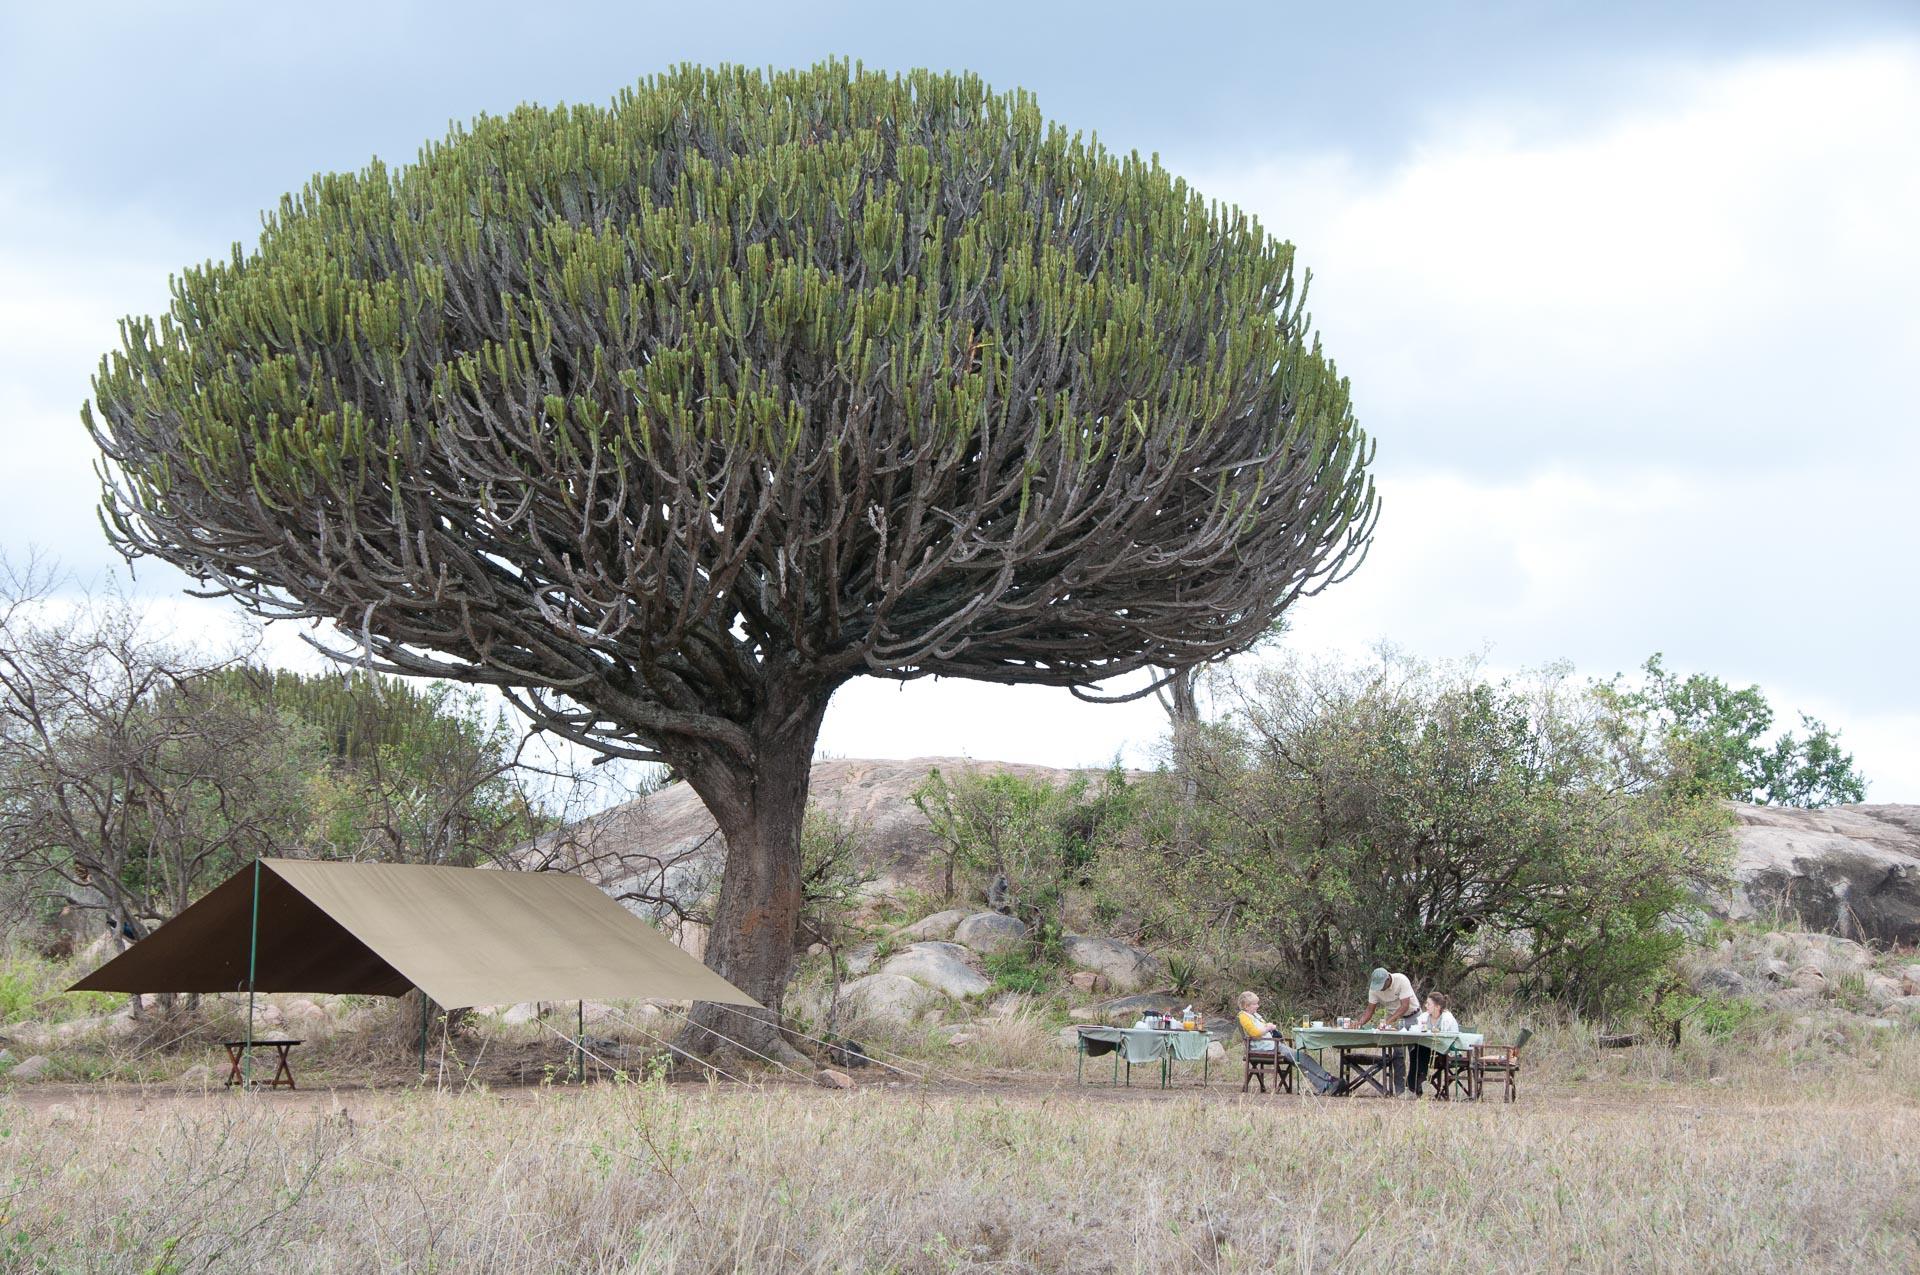 Serengeti-NationalparkTansania-Globetrotter-Select-019